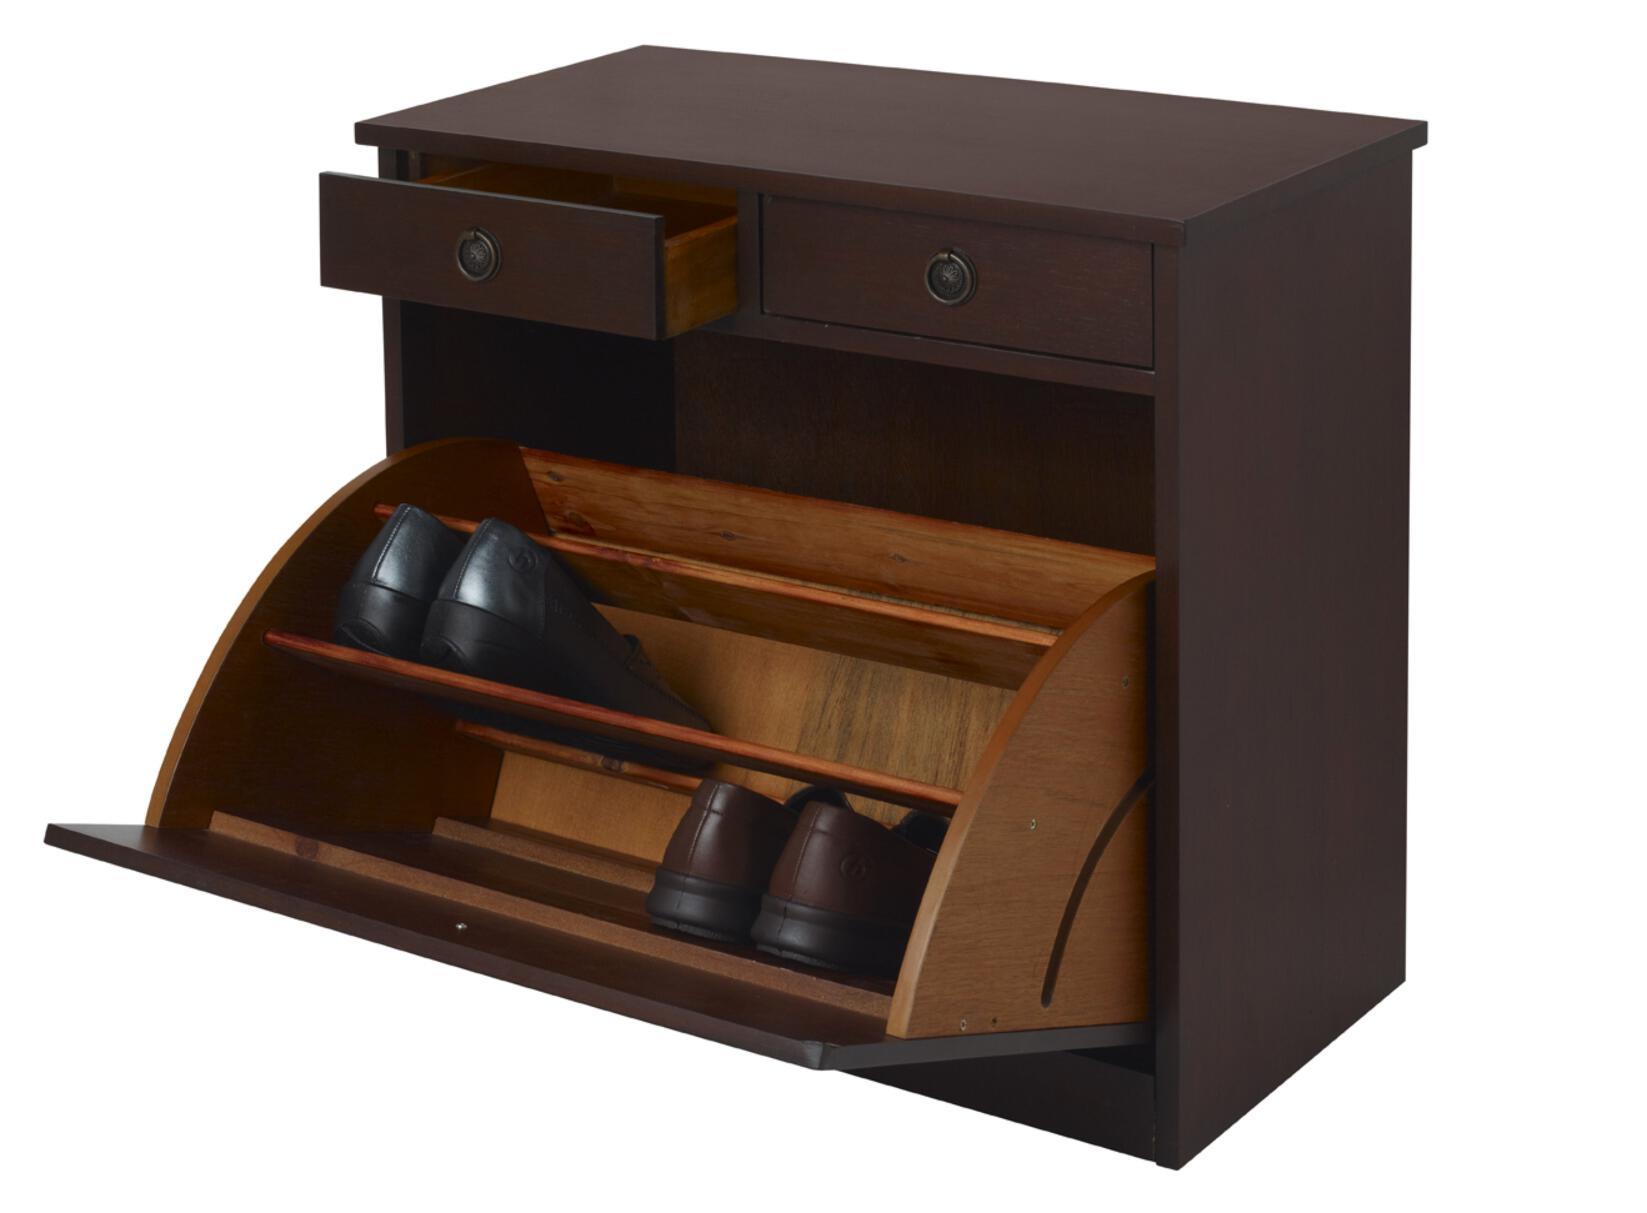 Slimline mahogany shoe cabinet tidy chest of drawers